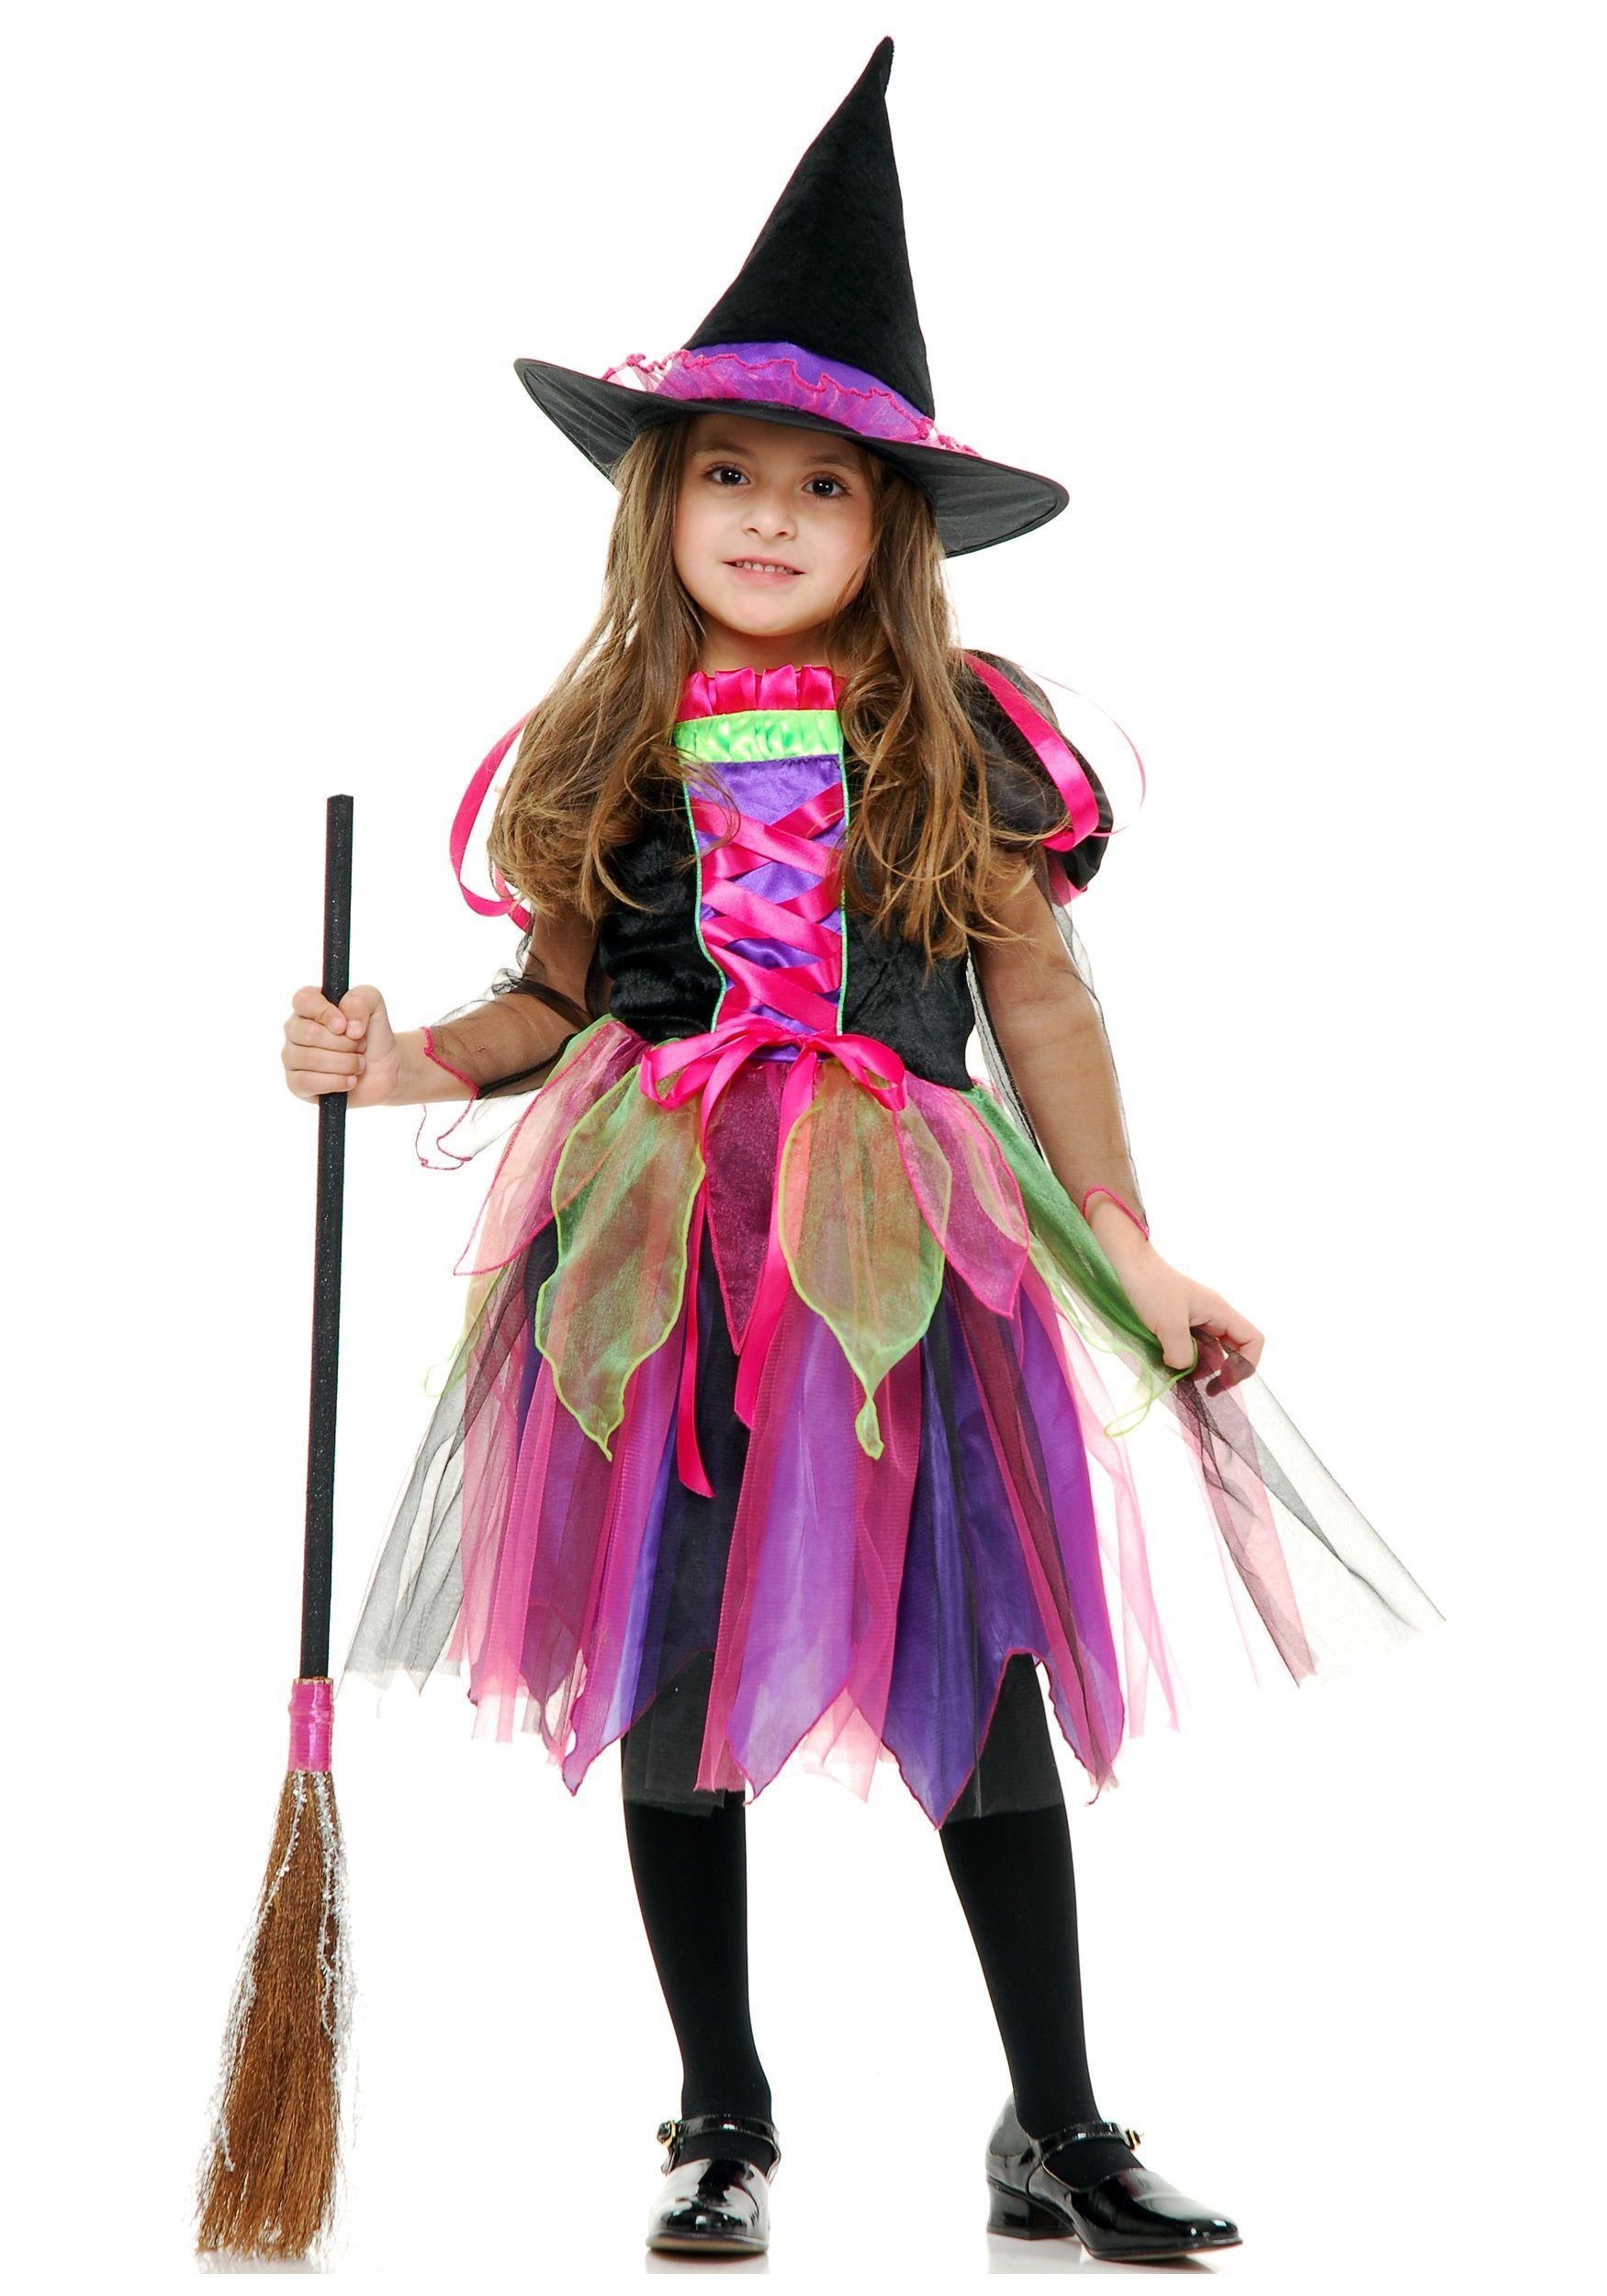 kid+witch+costumes Costumes > Witch Costumes > Child